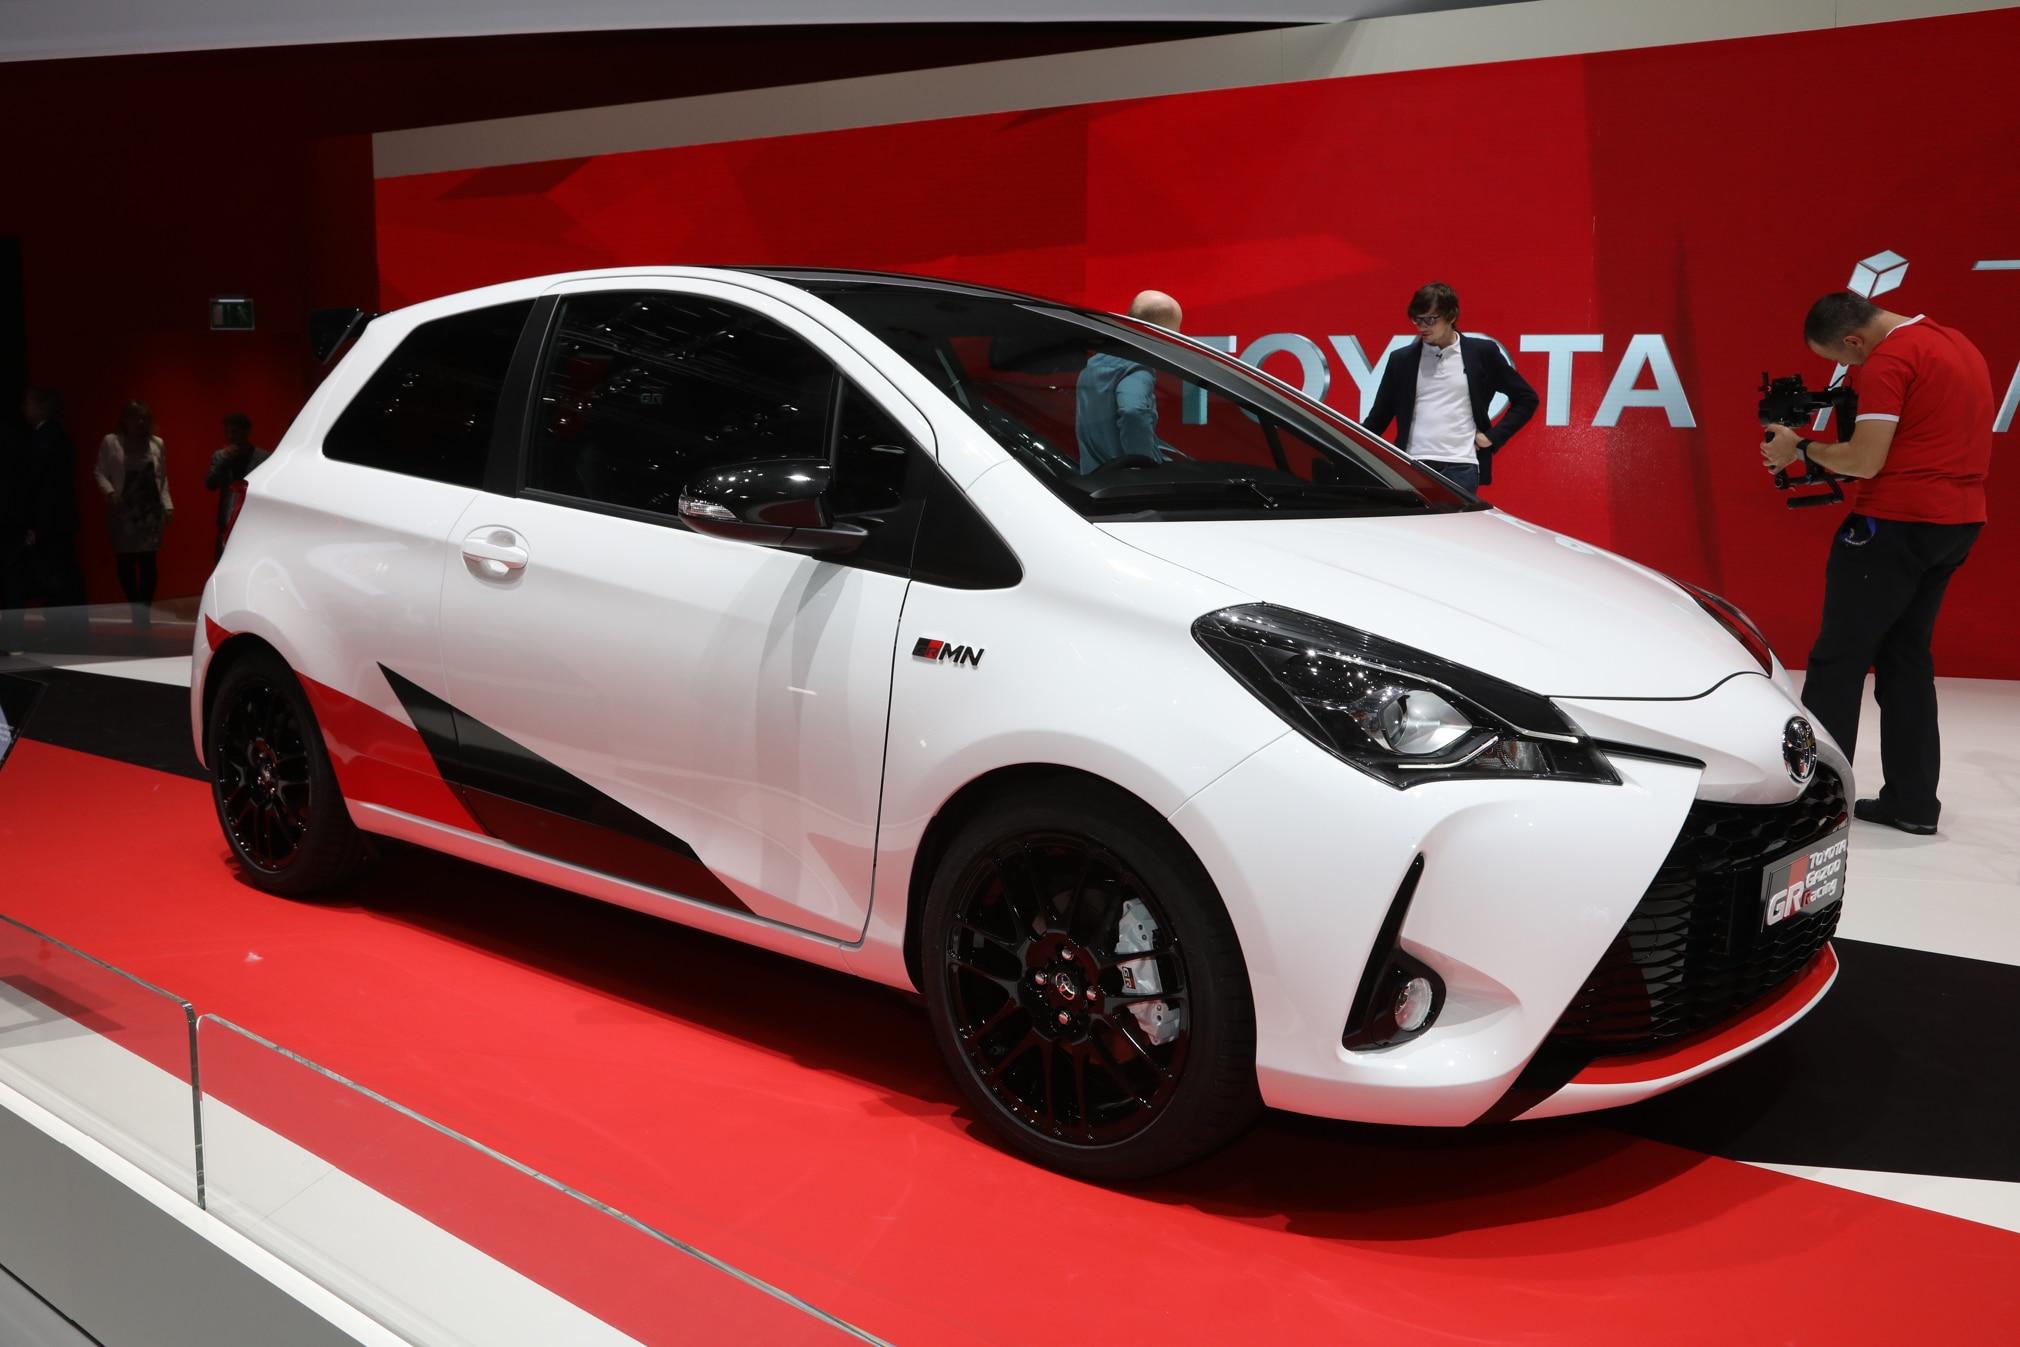 Toyota Yaris GRMN Front Three Quarter 02